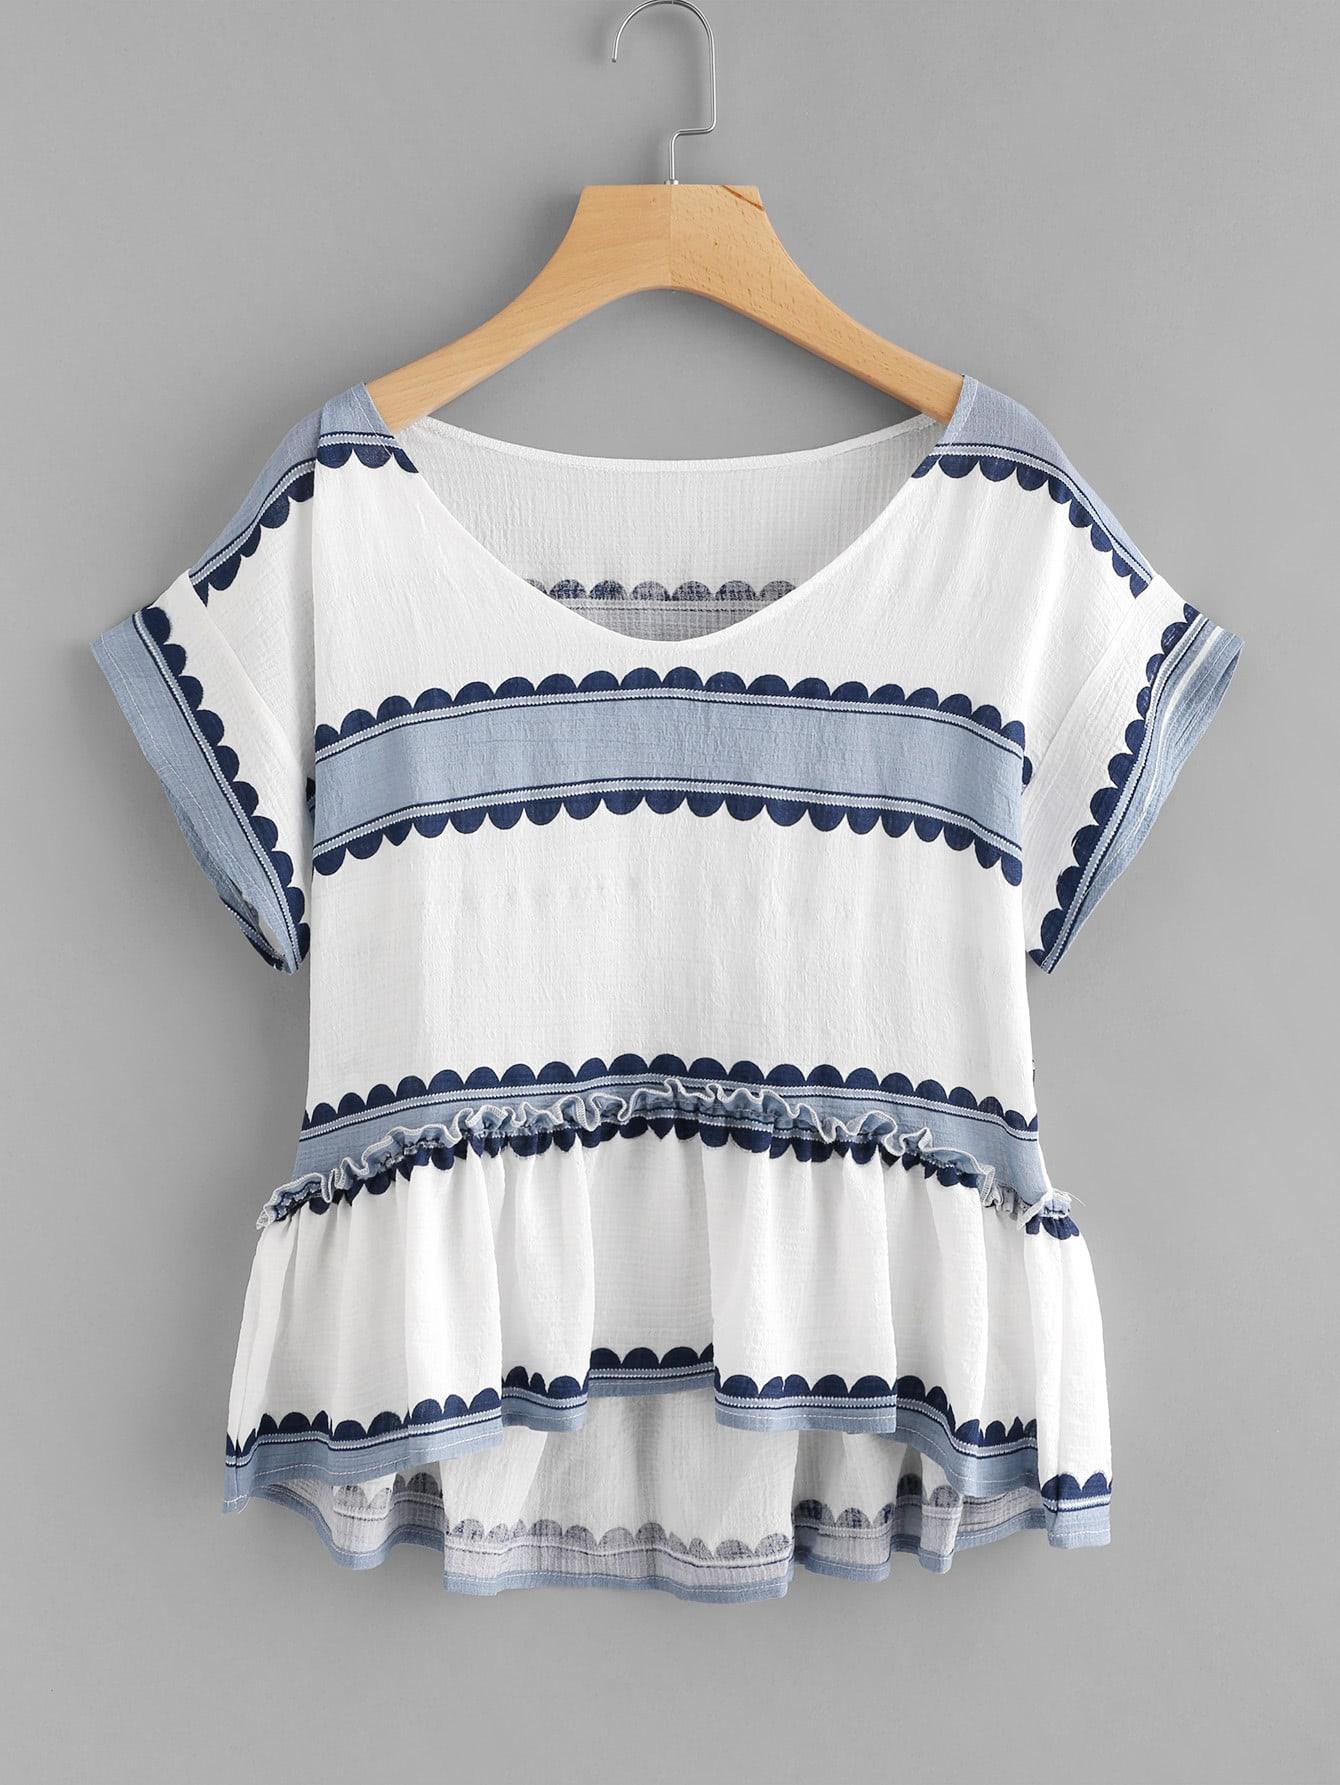 Contrast Print Frill Hem Blouse contrast striped knotted hem frill blouse